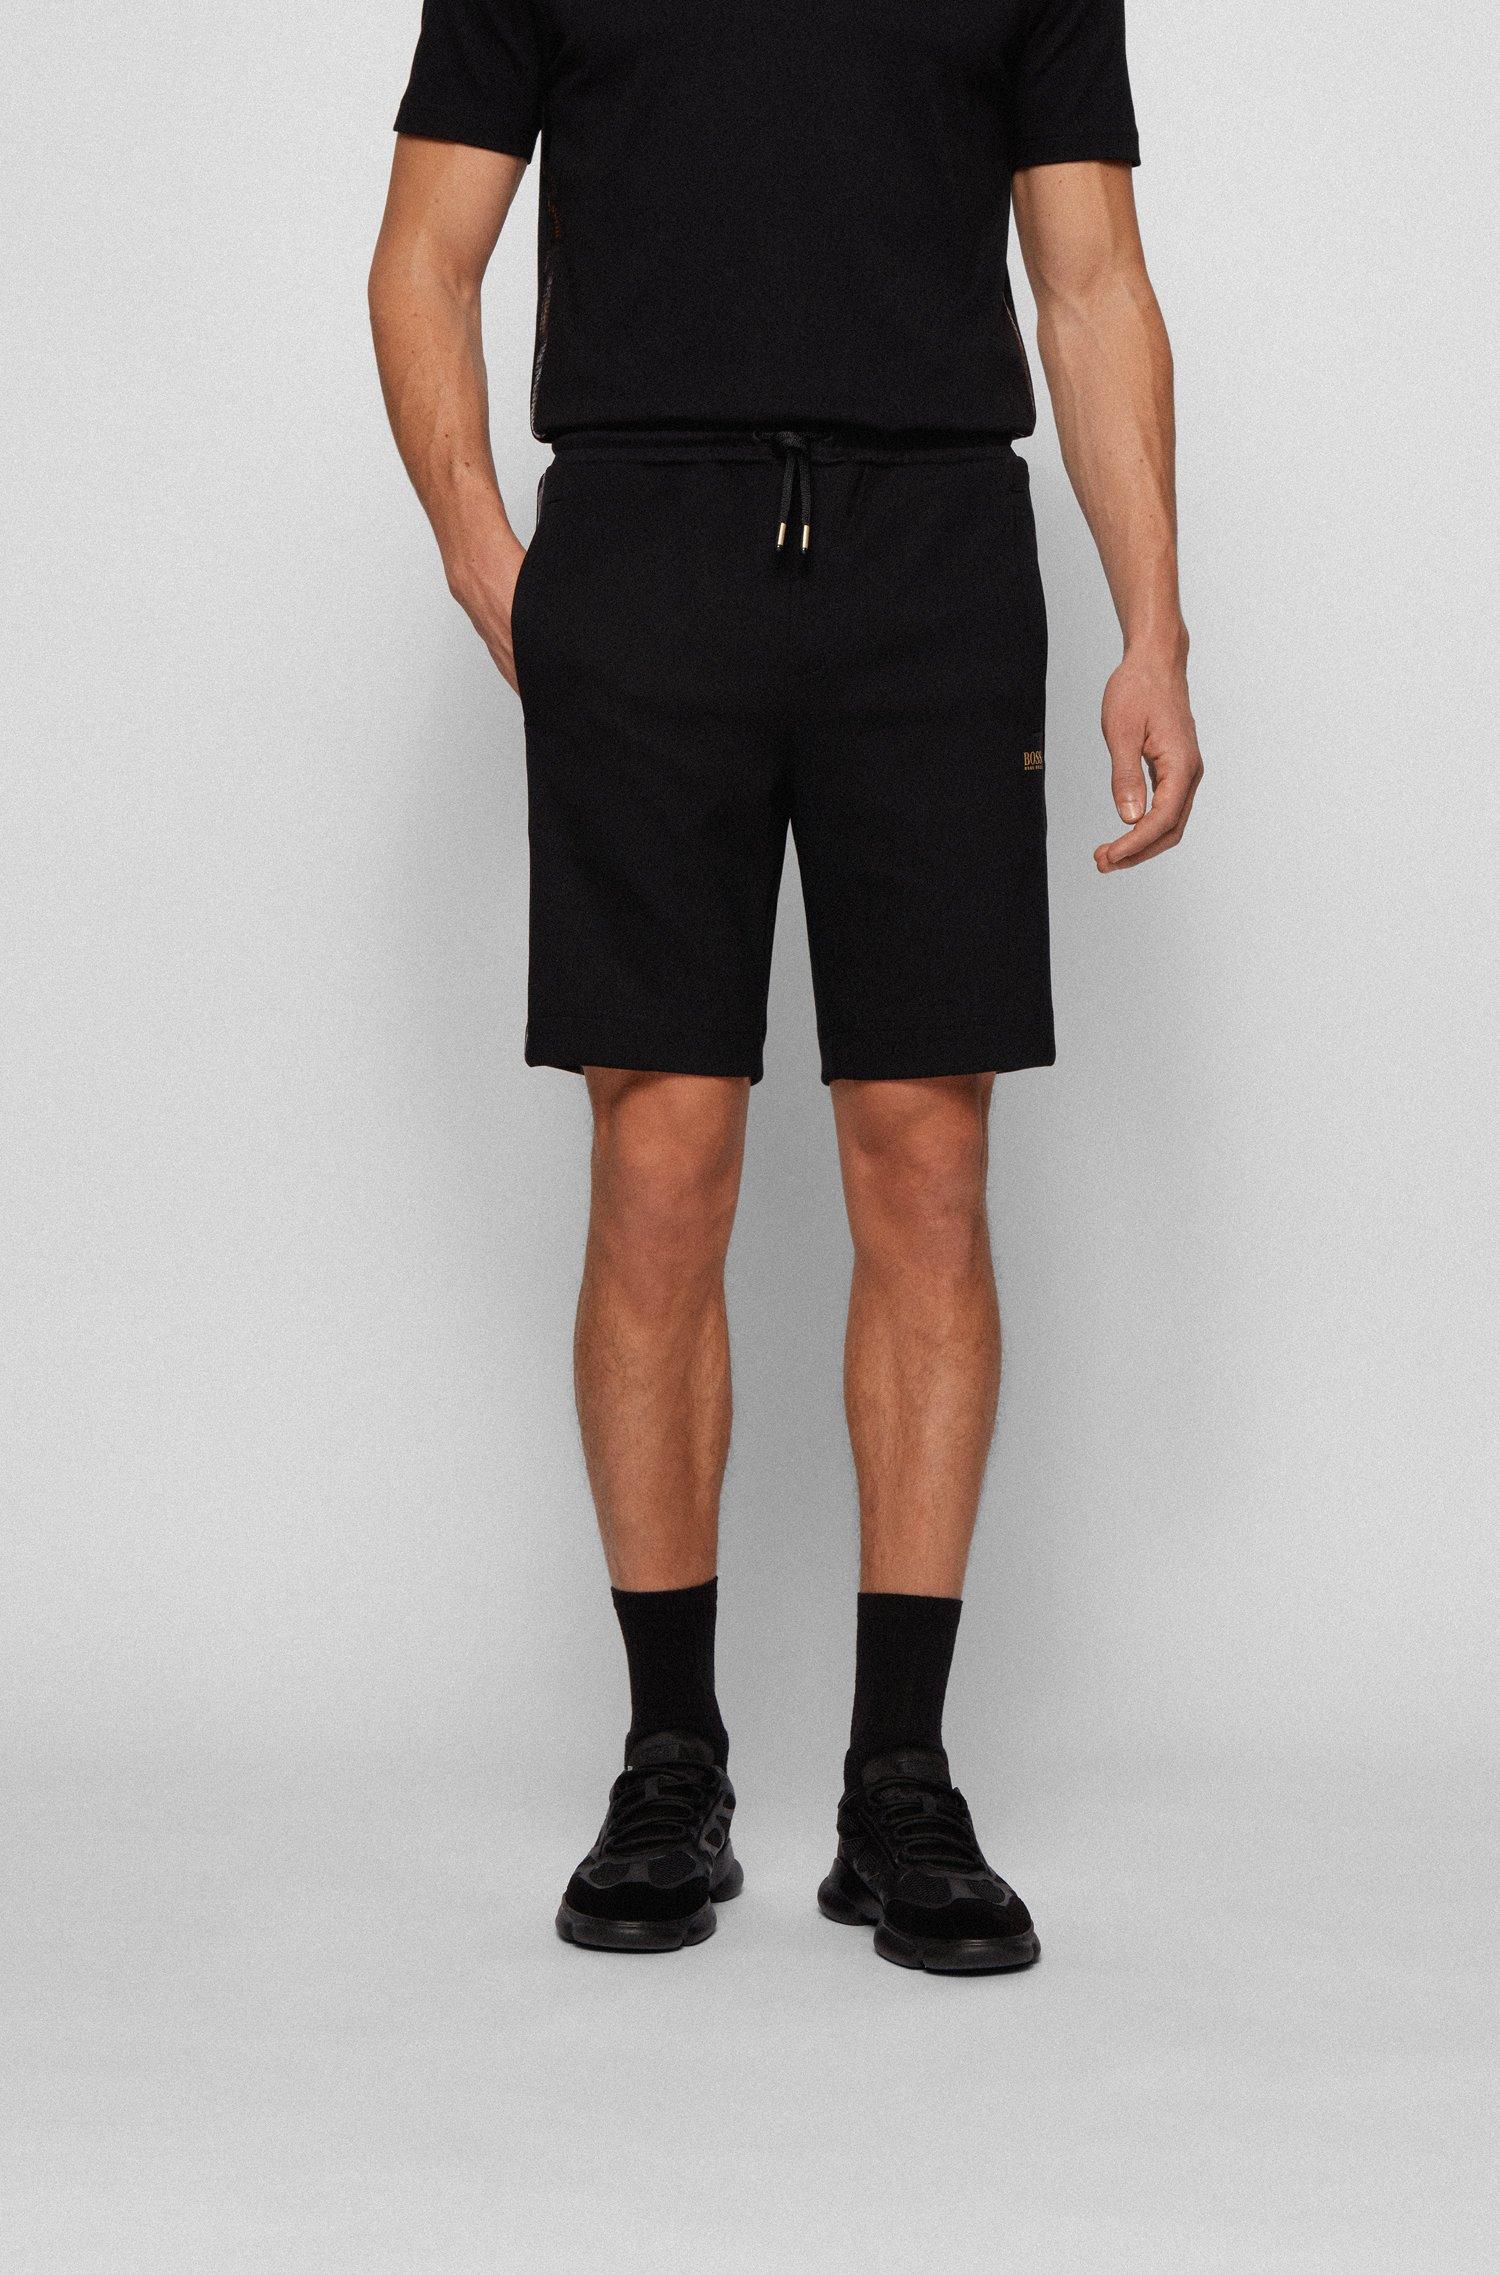 Cotton-blend shorts with gold logo detailing, Black